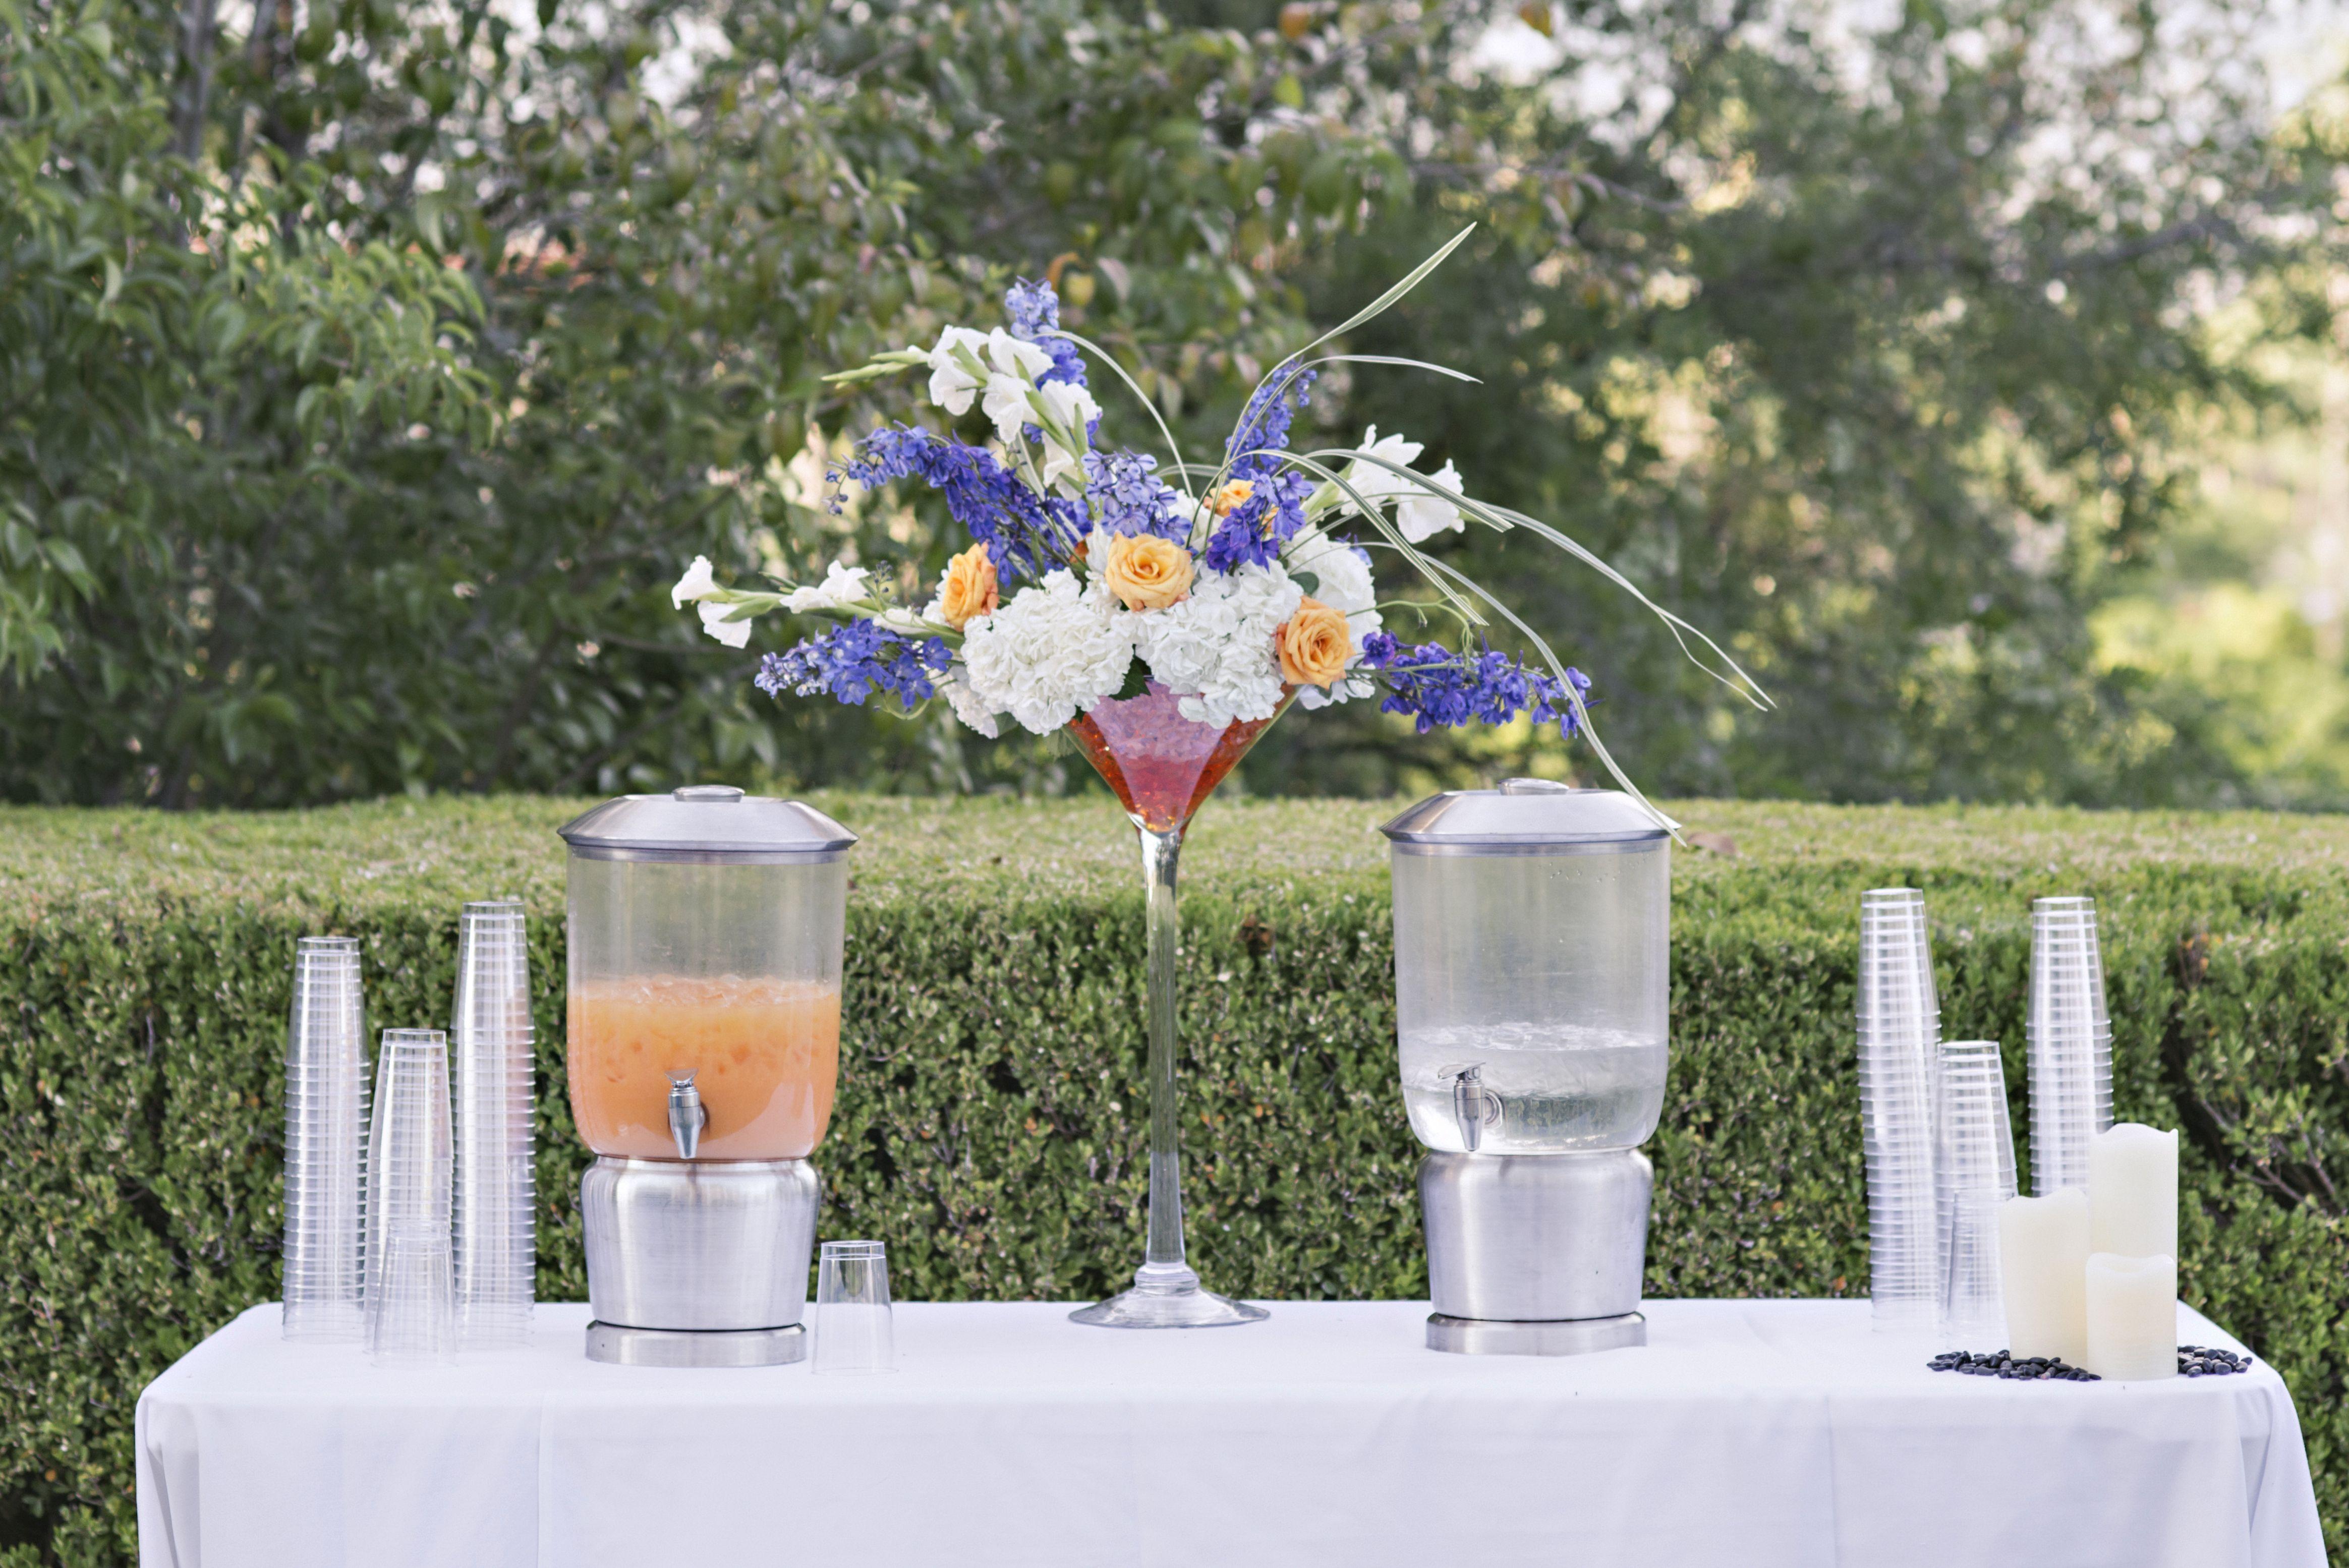 Cocktail Hour Beverages Cocktails, Cocktail hour